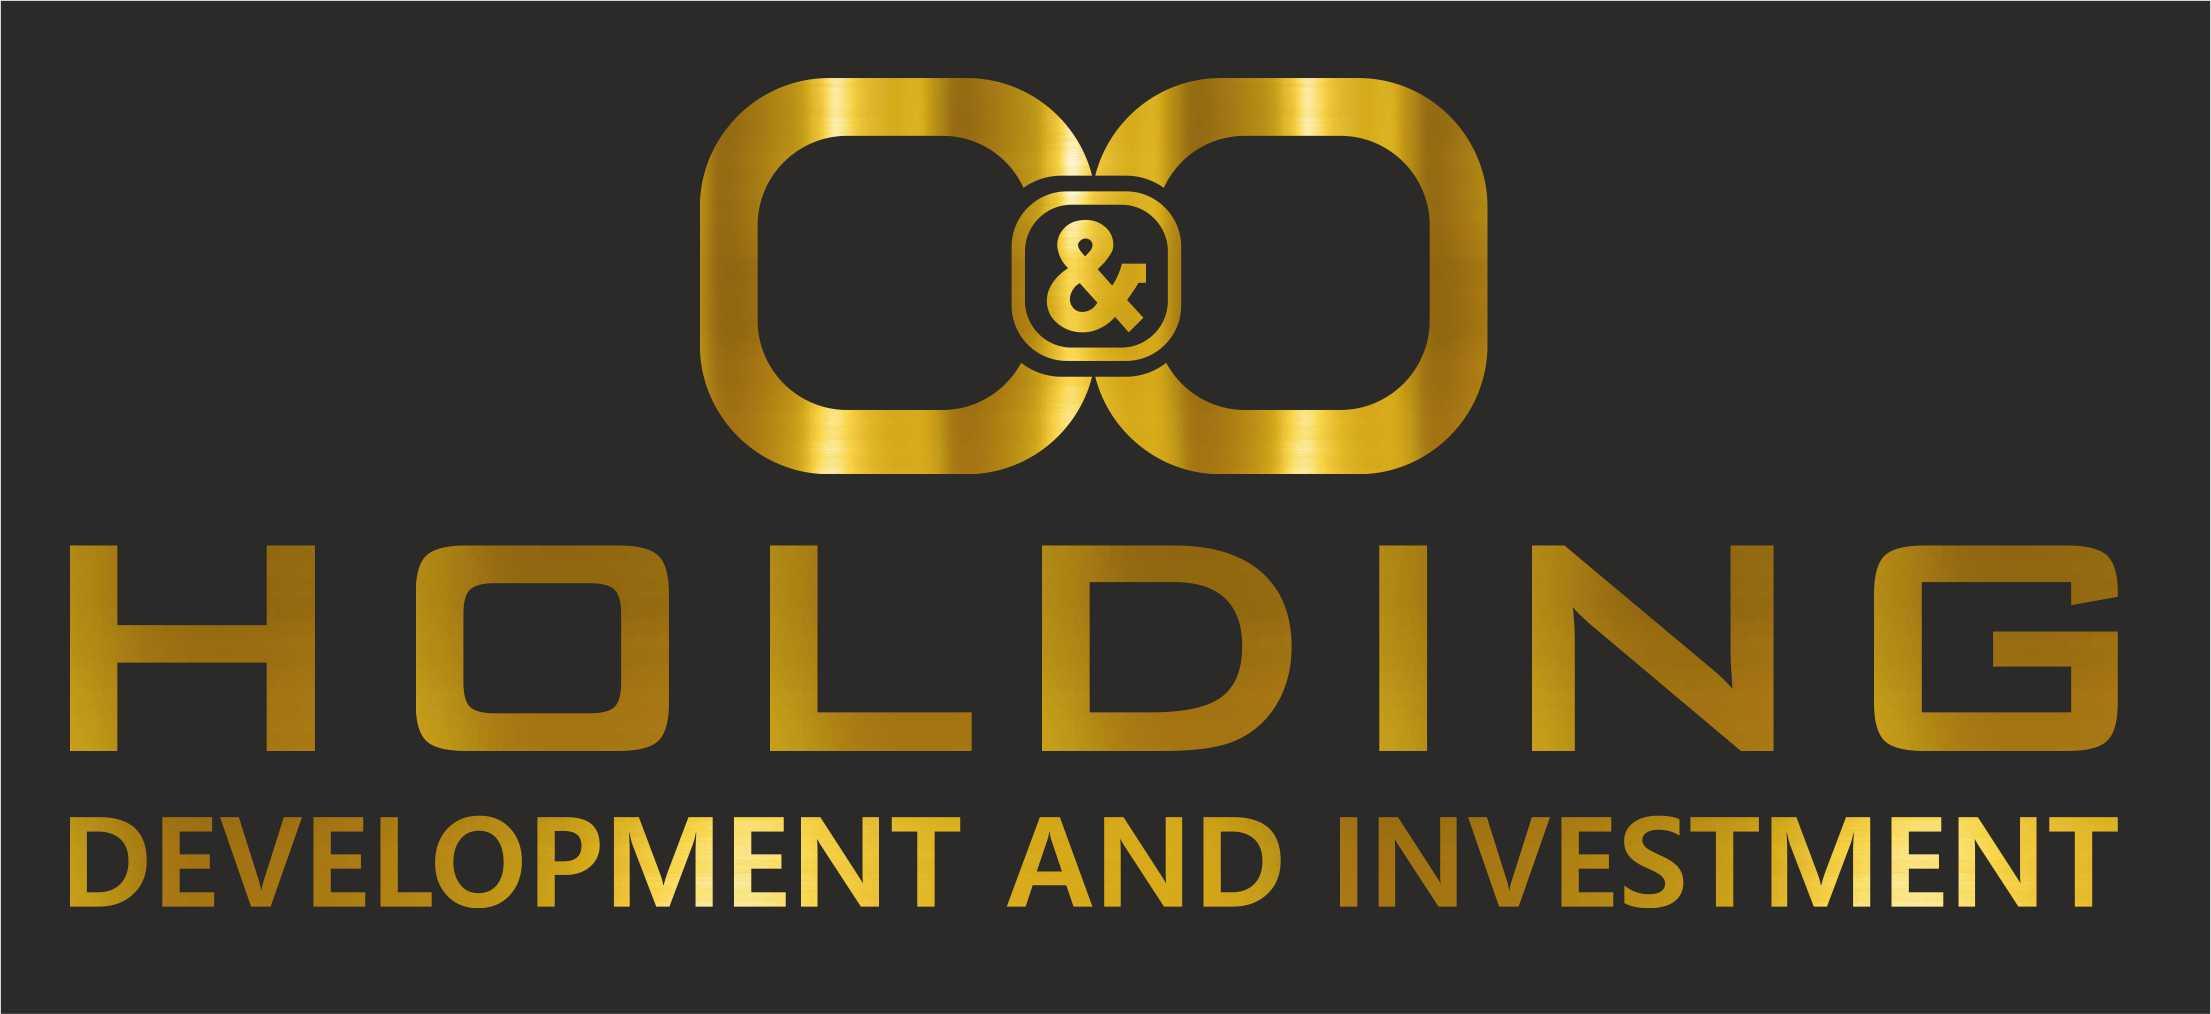 "Разработка Логотипа +  Фирменного знака для компании ""O & O HOLDING"" фото f_2585c80300ddec6f.jpg"